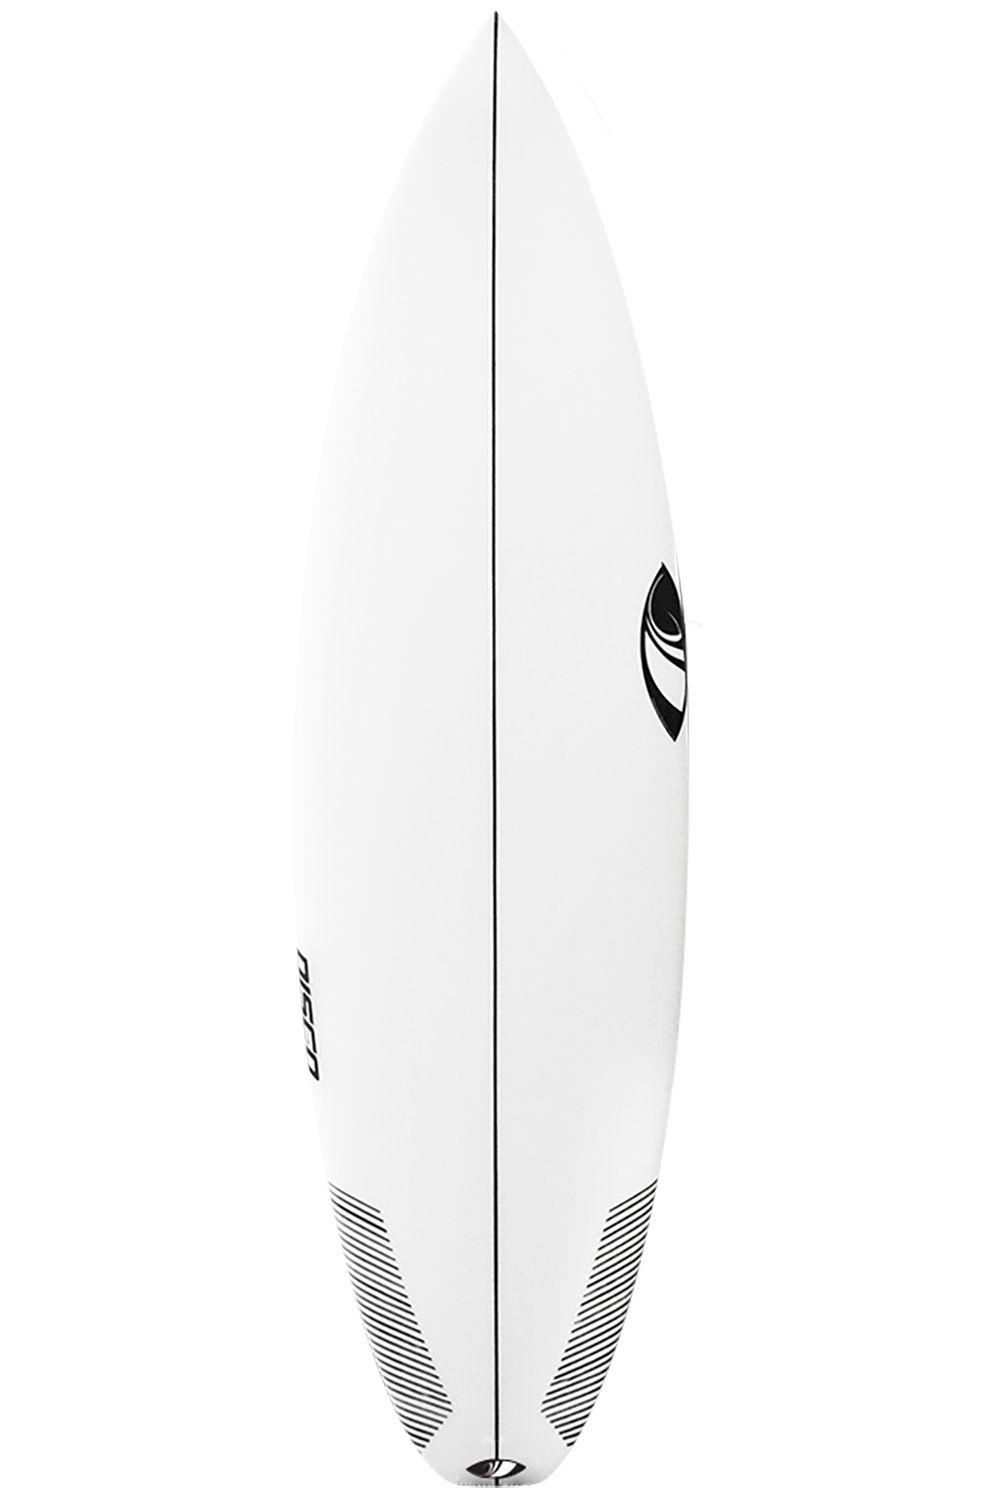 Prancha Surf Sharpeye 5'10 DISCO Squash Tail - White FCS II 5ft10